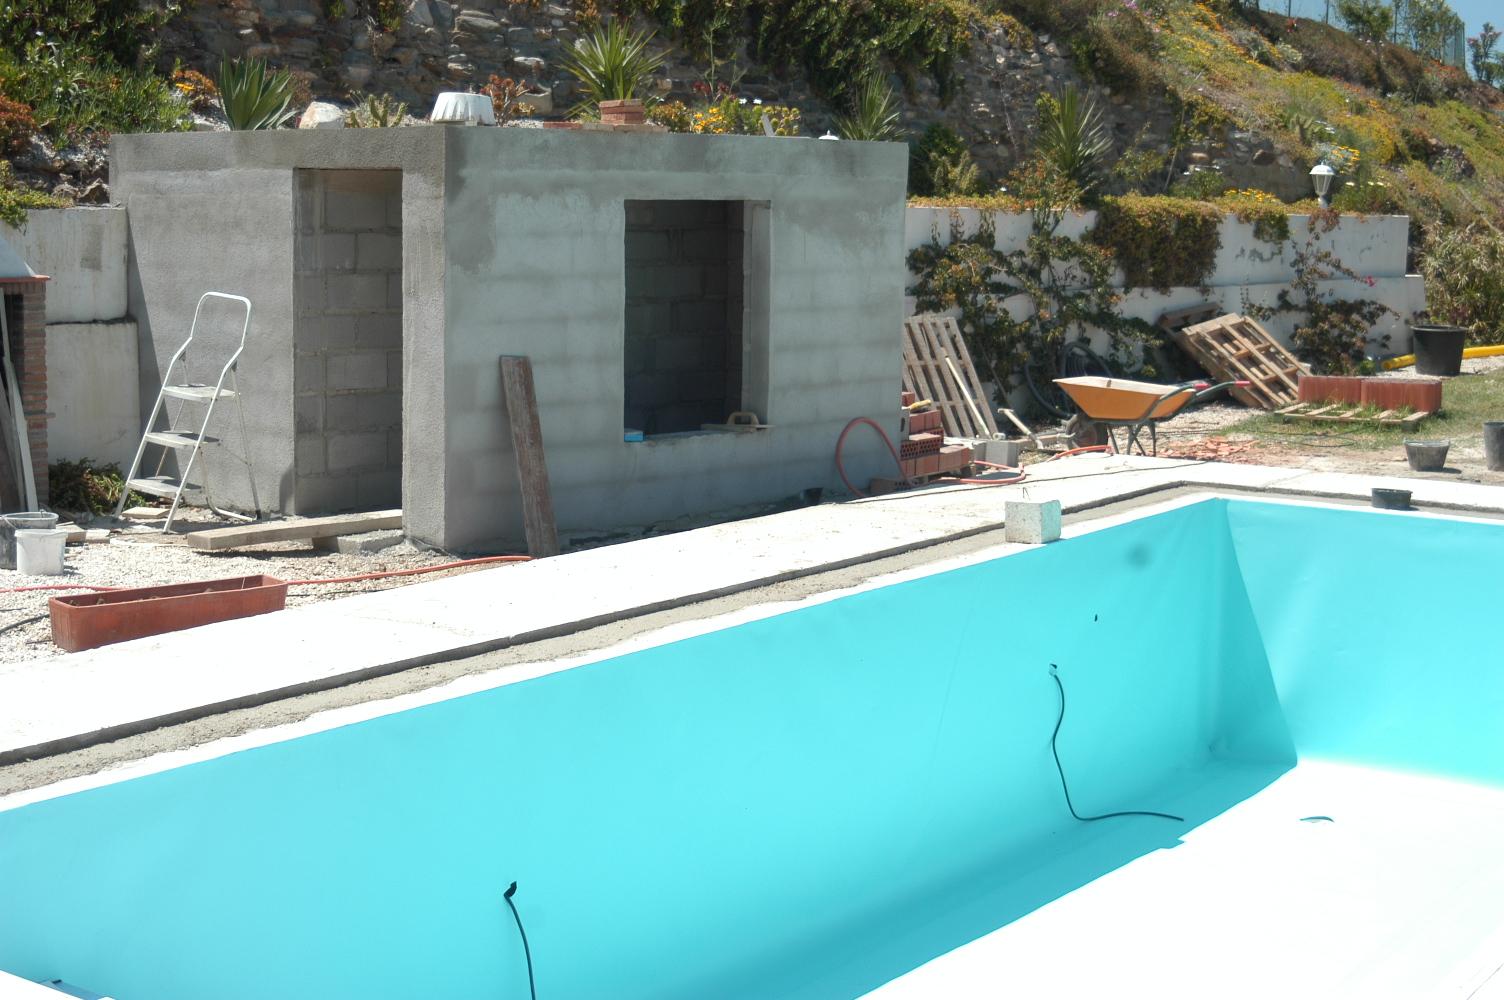 10 Poolhaus